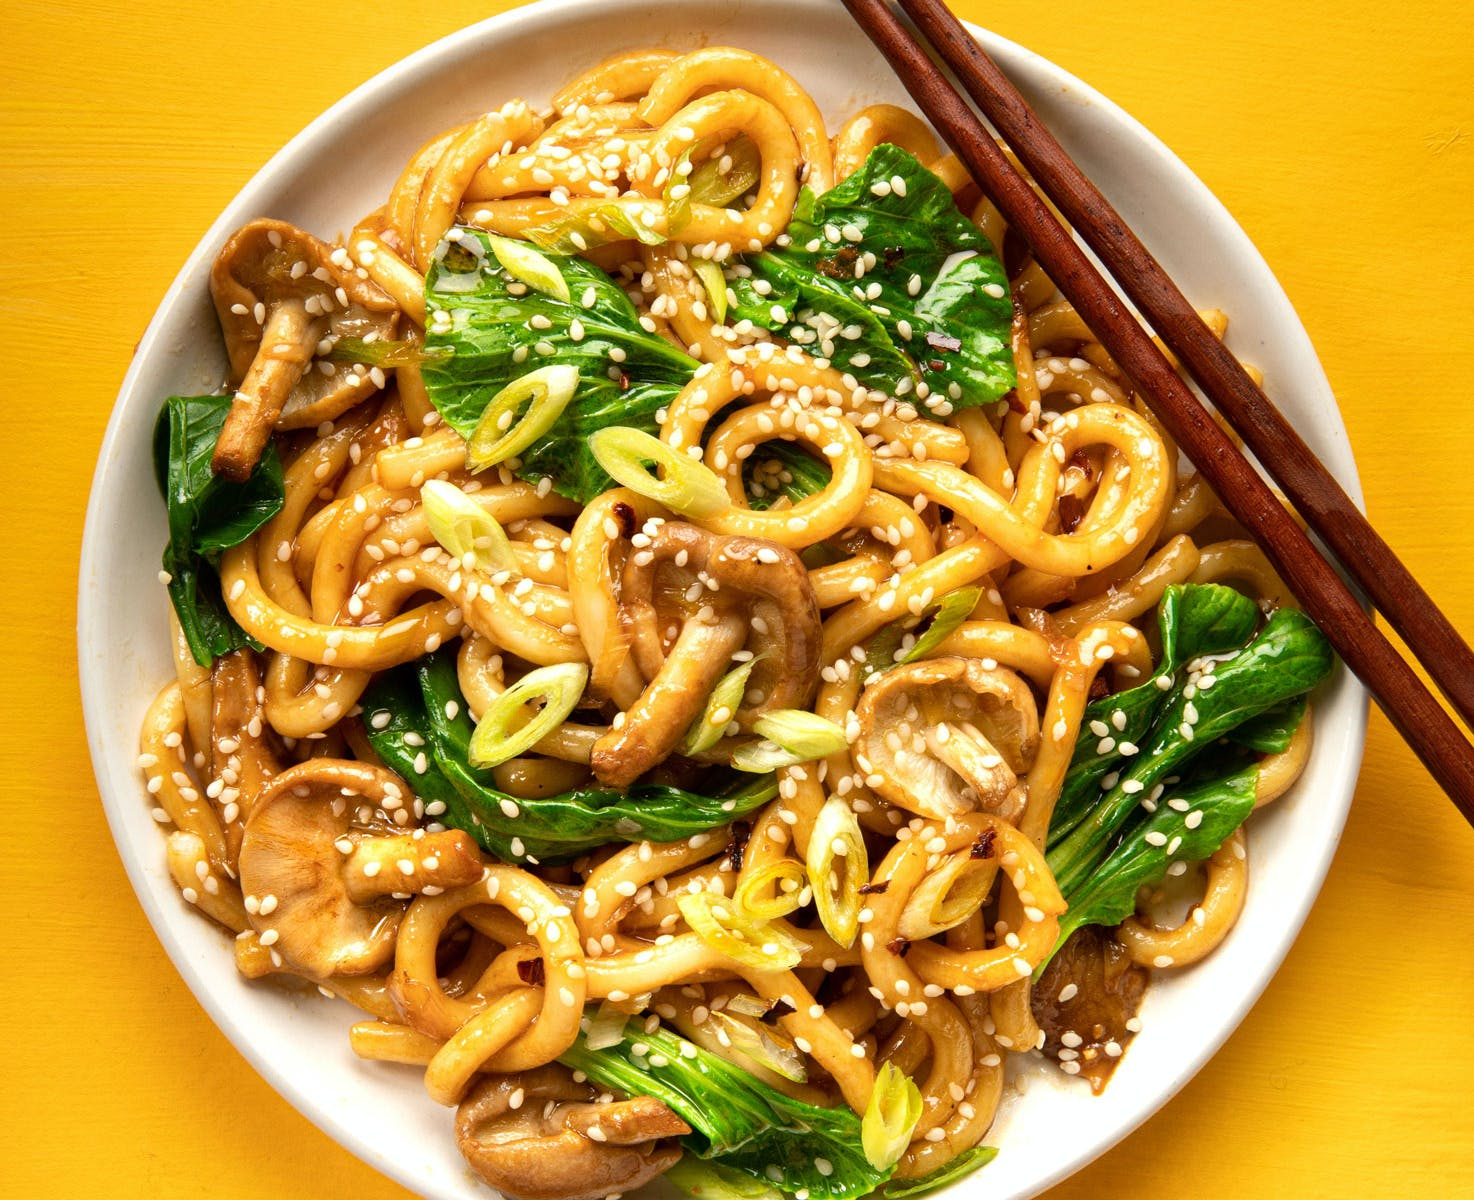 udon stir fry and chopsticks